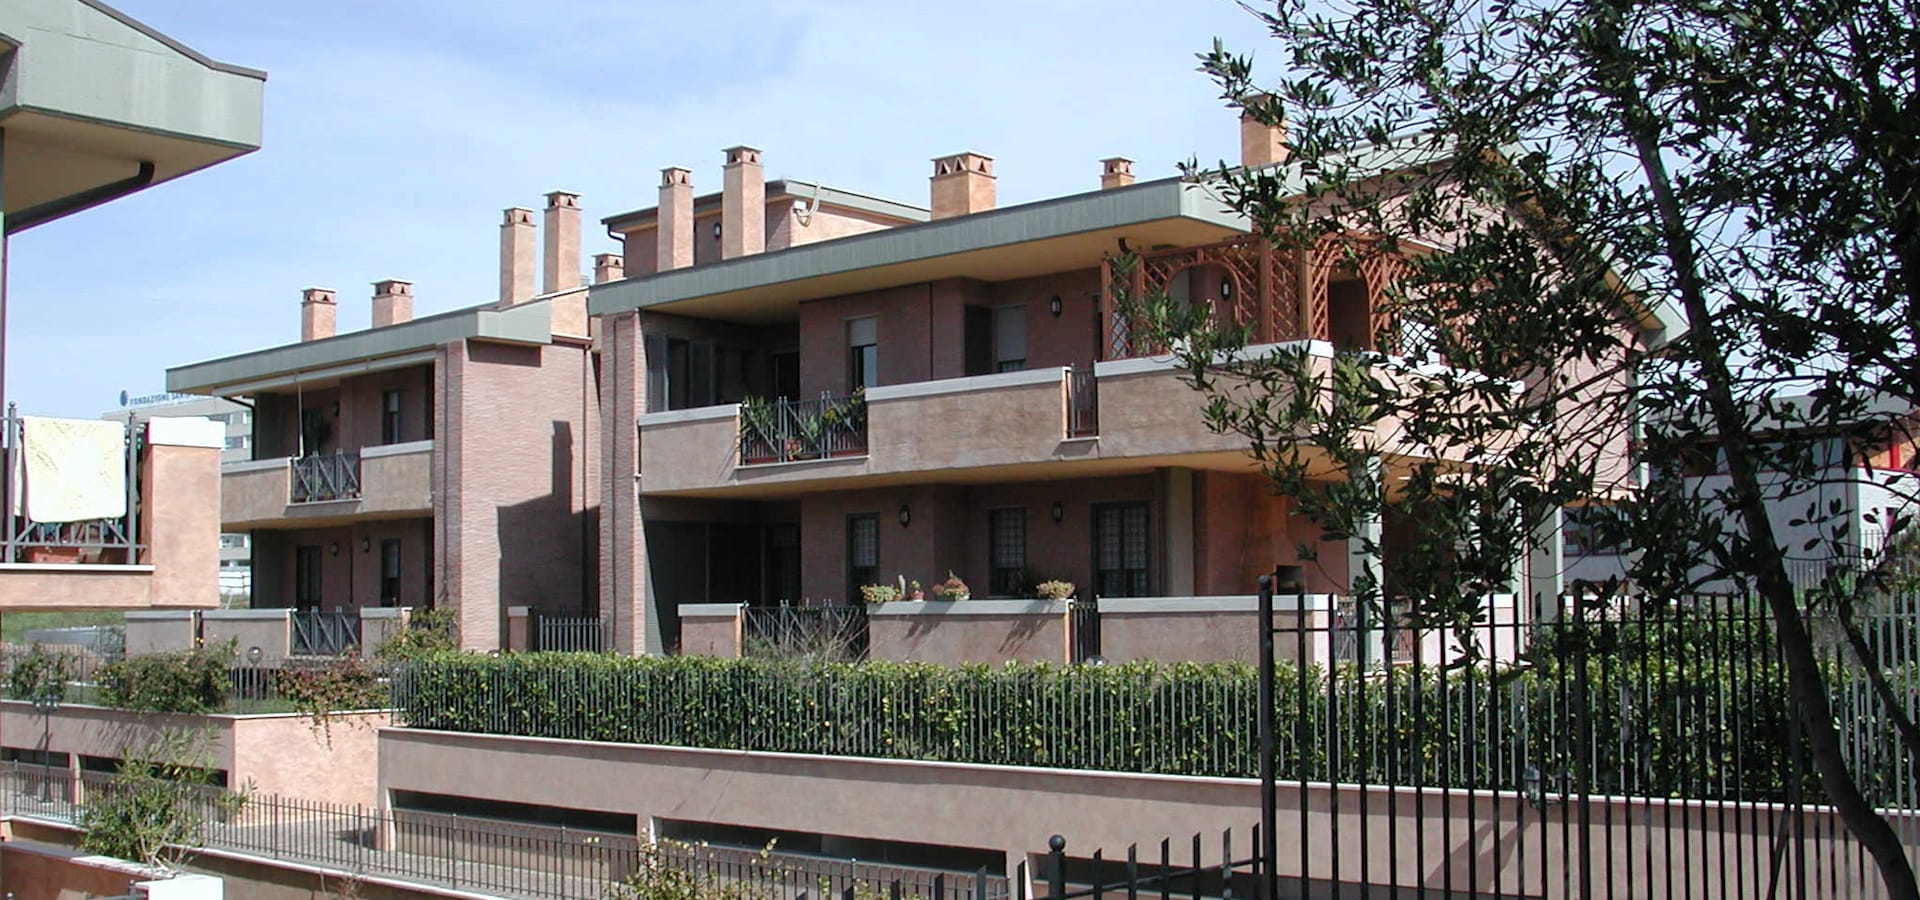 Studio Cardone – C.SA.C.